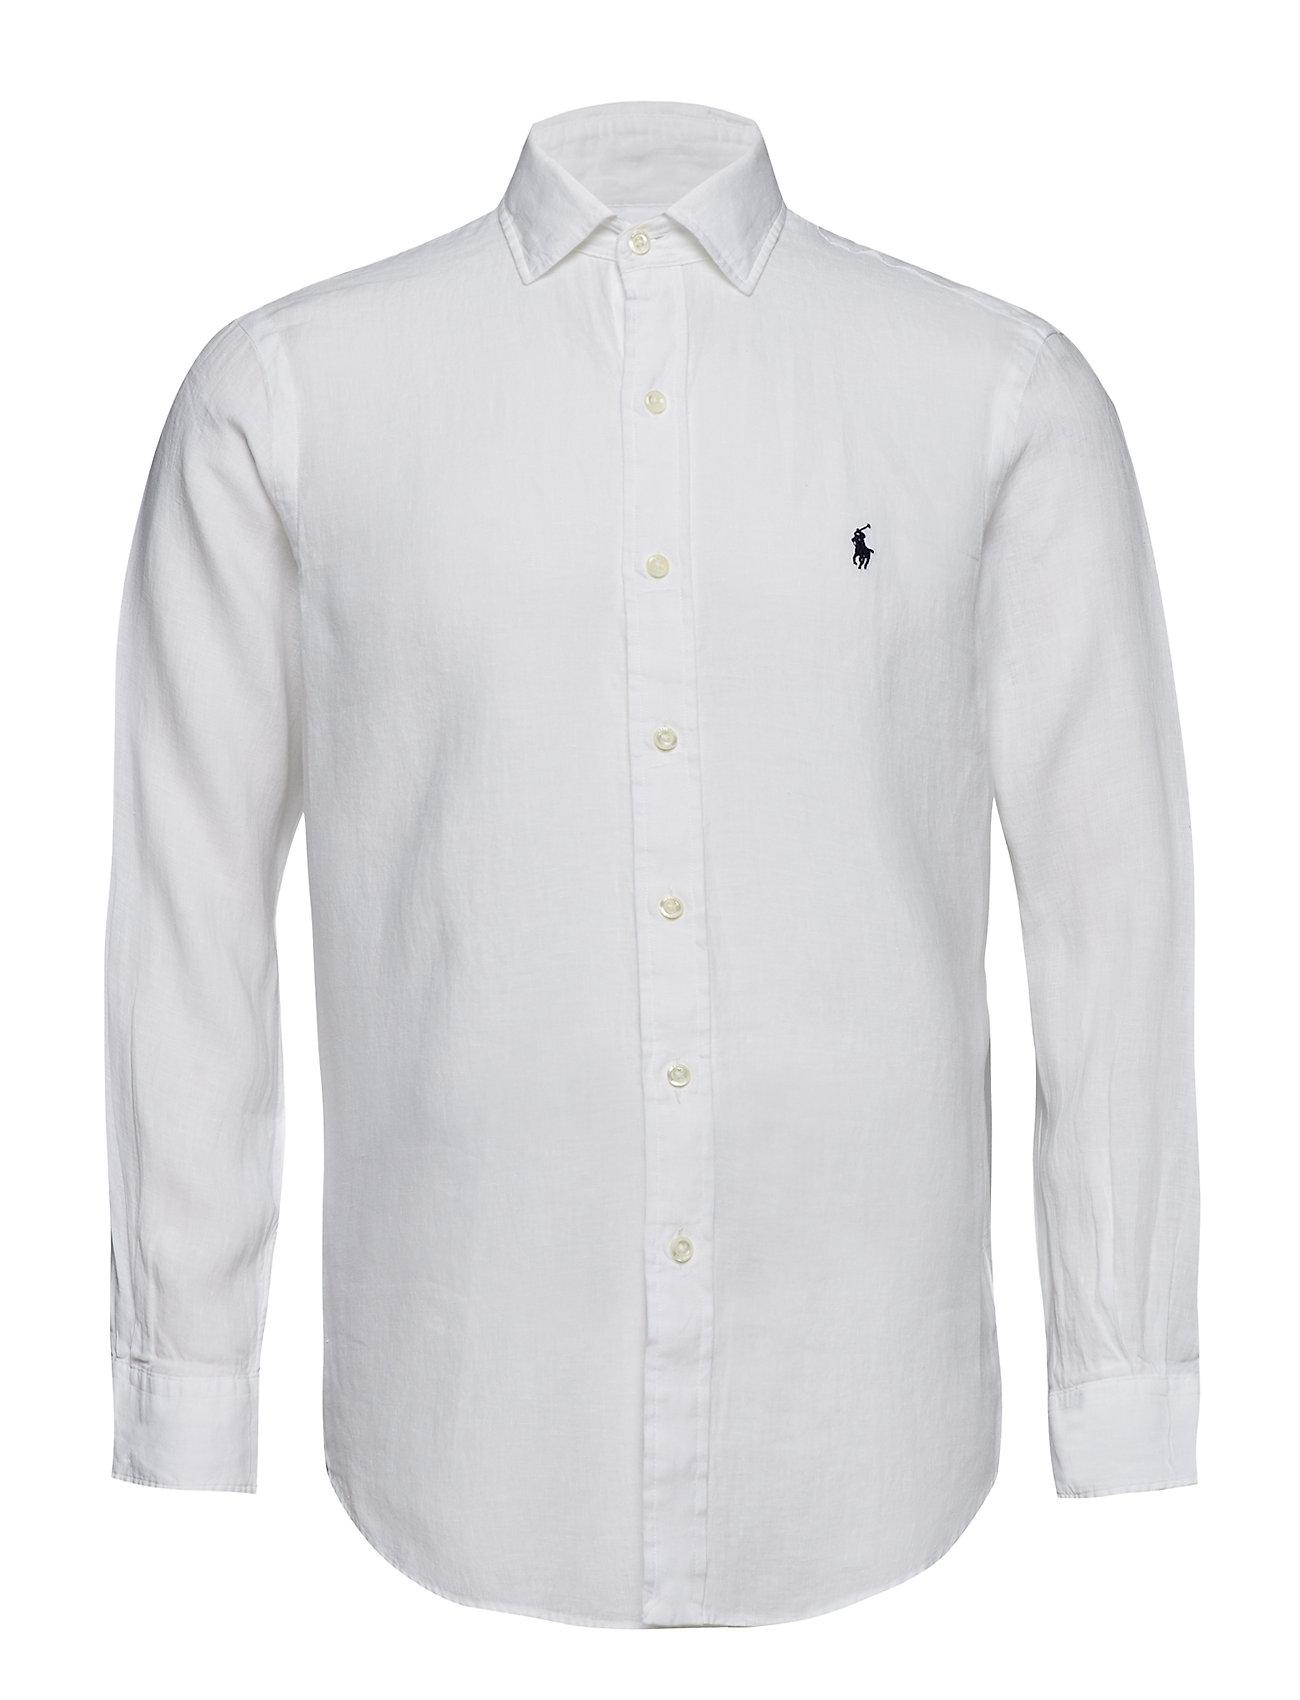 Polo Ralph Lauren SPR EST PPC-LONG SLEEVE-SPORT SHIRT - WHITE